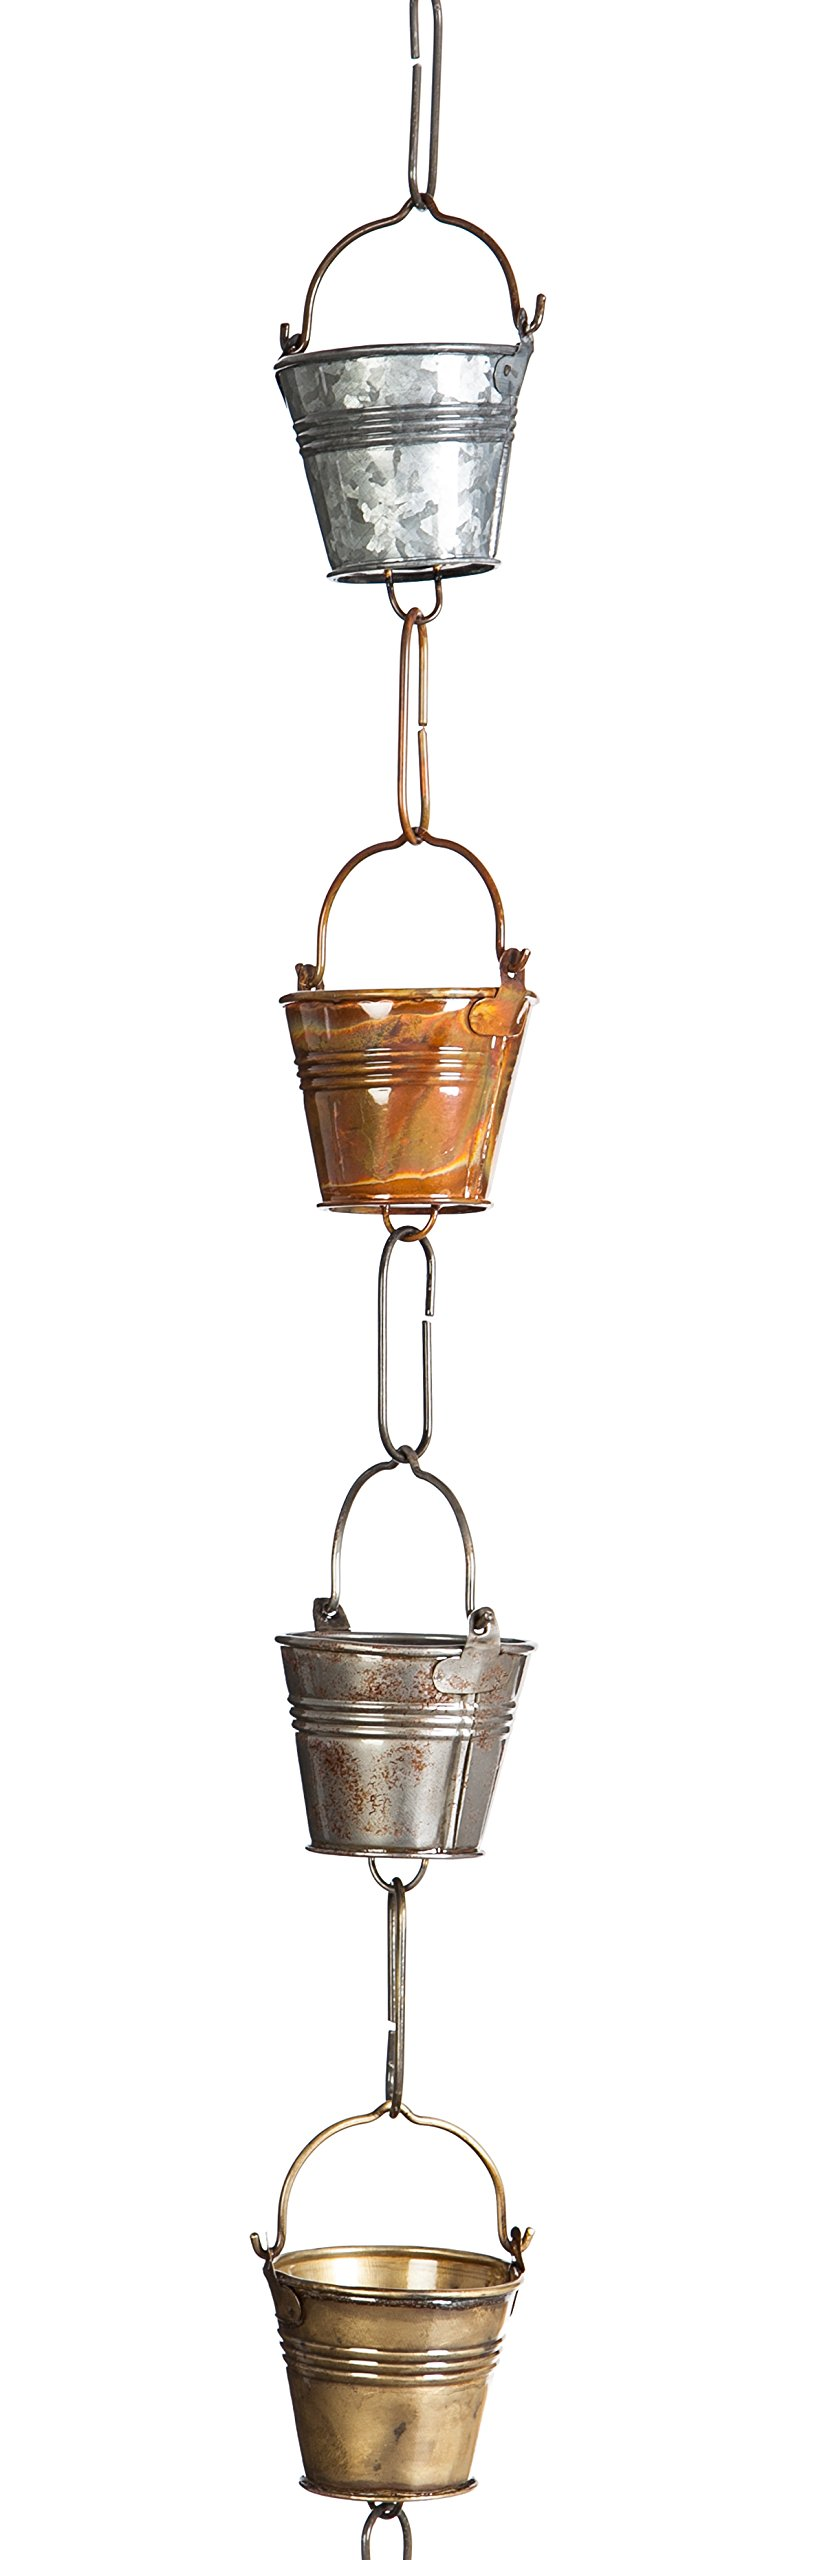 New Creative Galvanized Iron Buckets Rain Chain